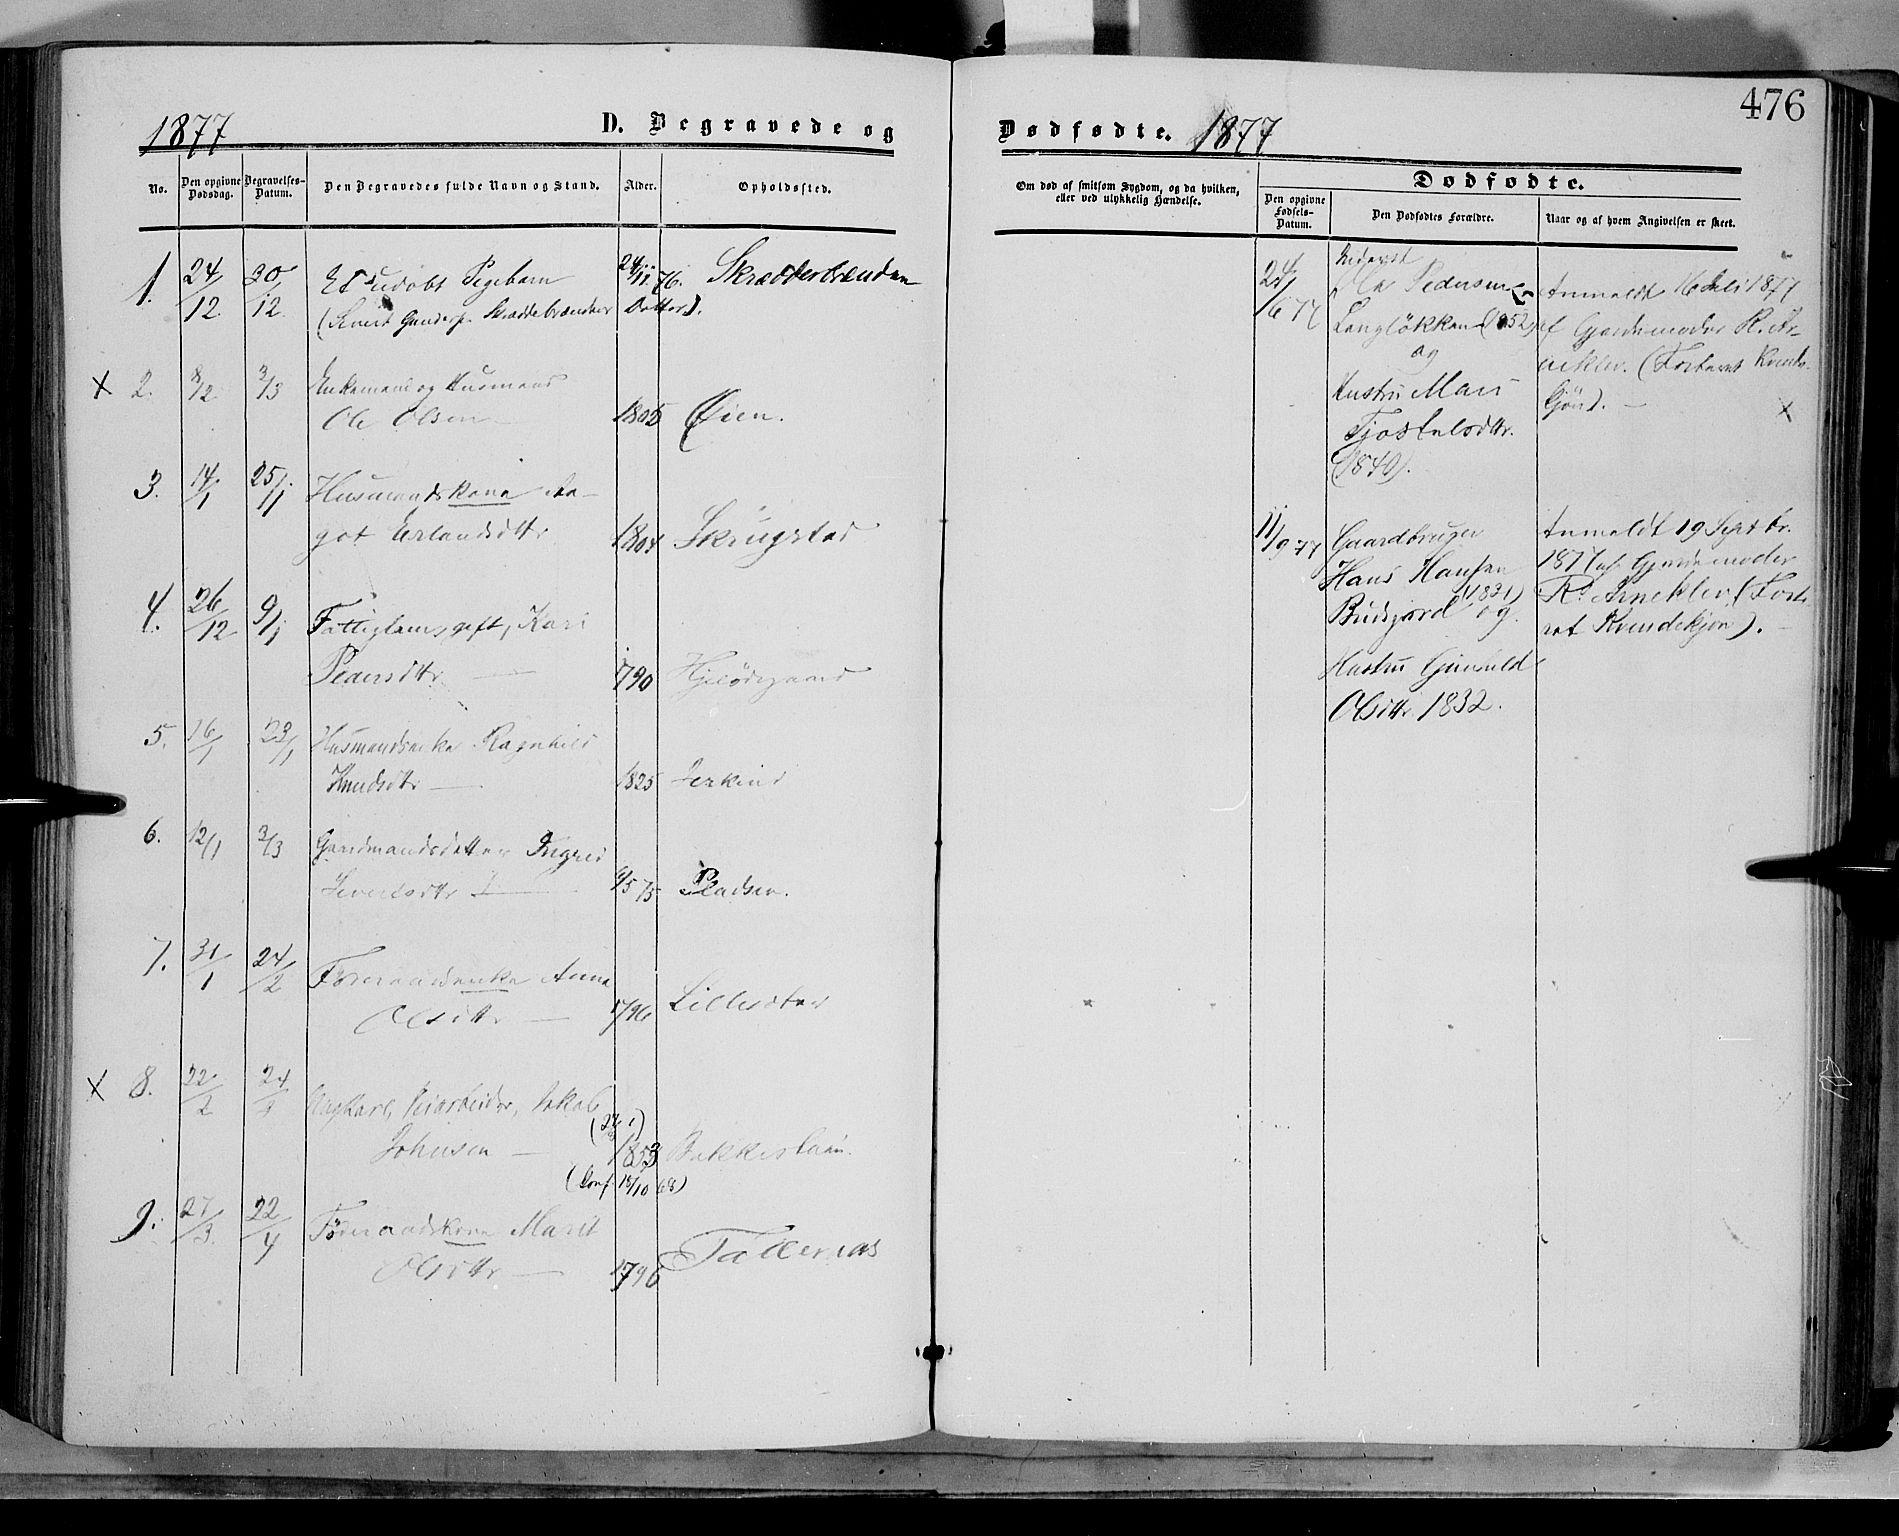 SAH, Dovre prestekontor, Ministerialbok nr. 1, 1854-1878, s. 476